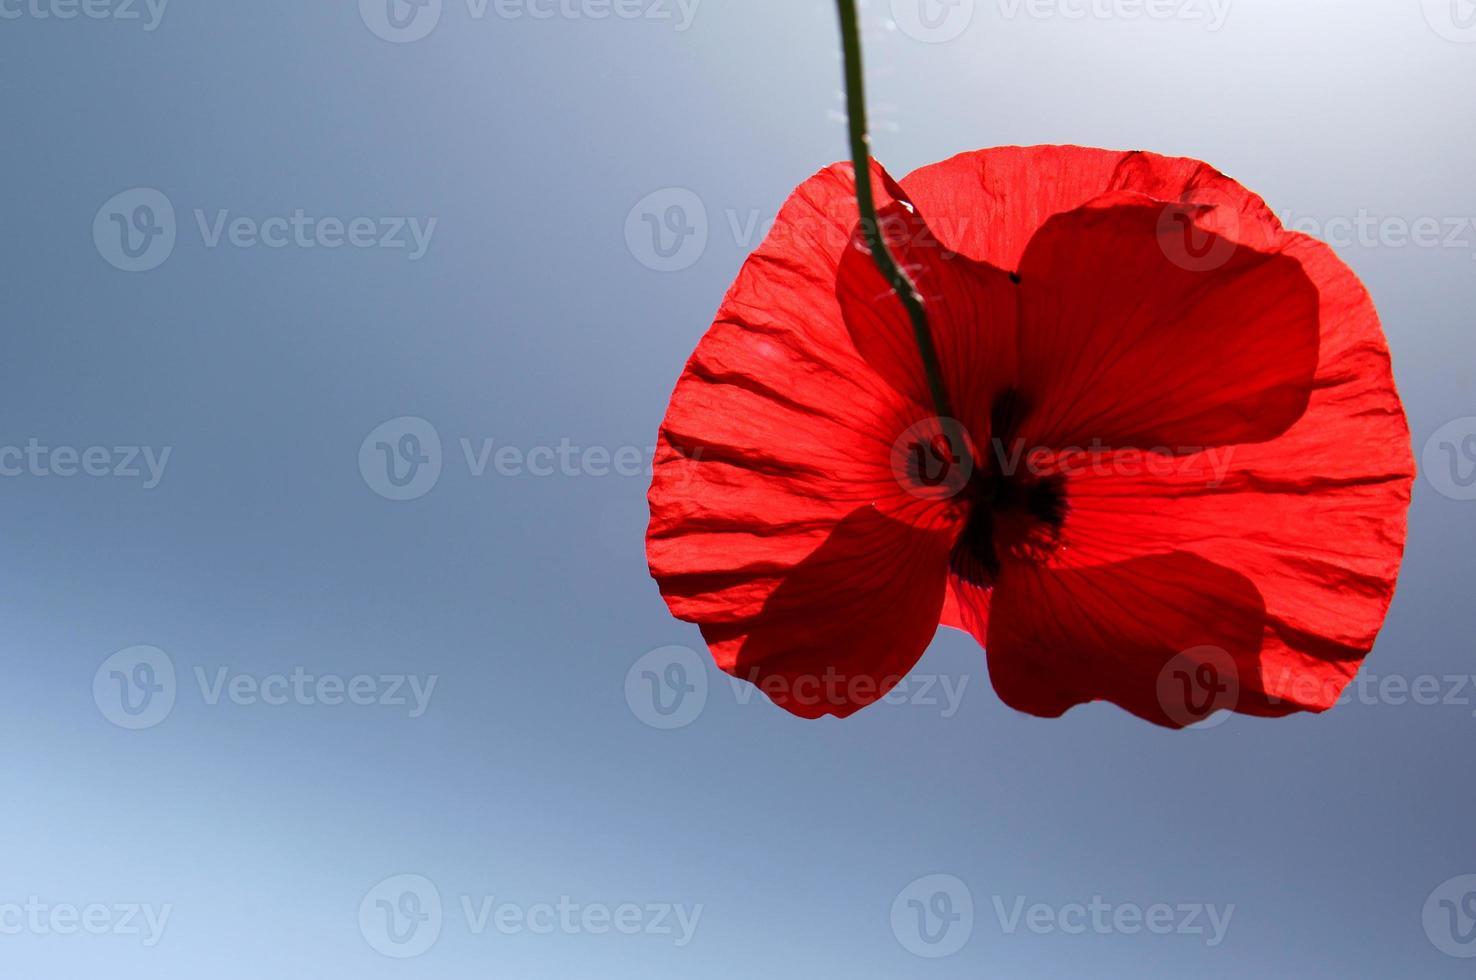 Red poppy flower with blue sky photo